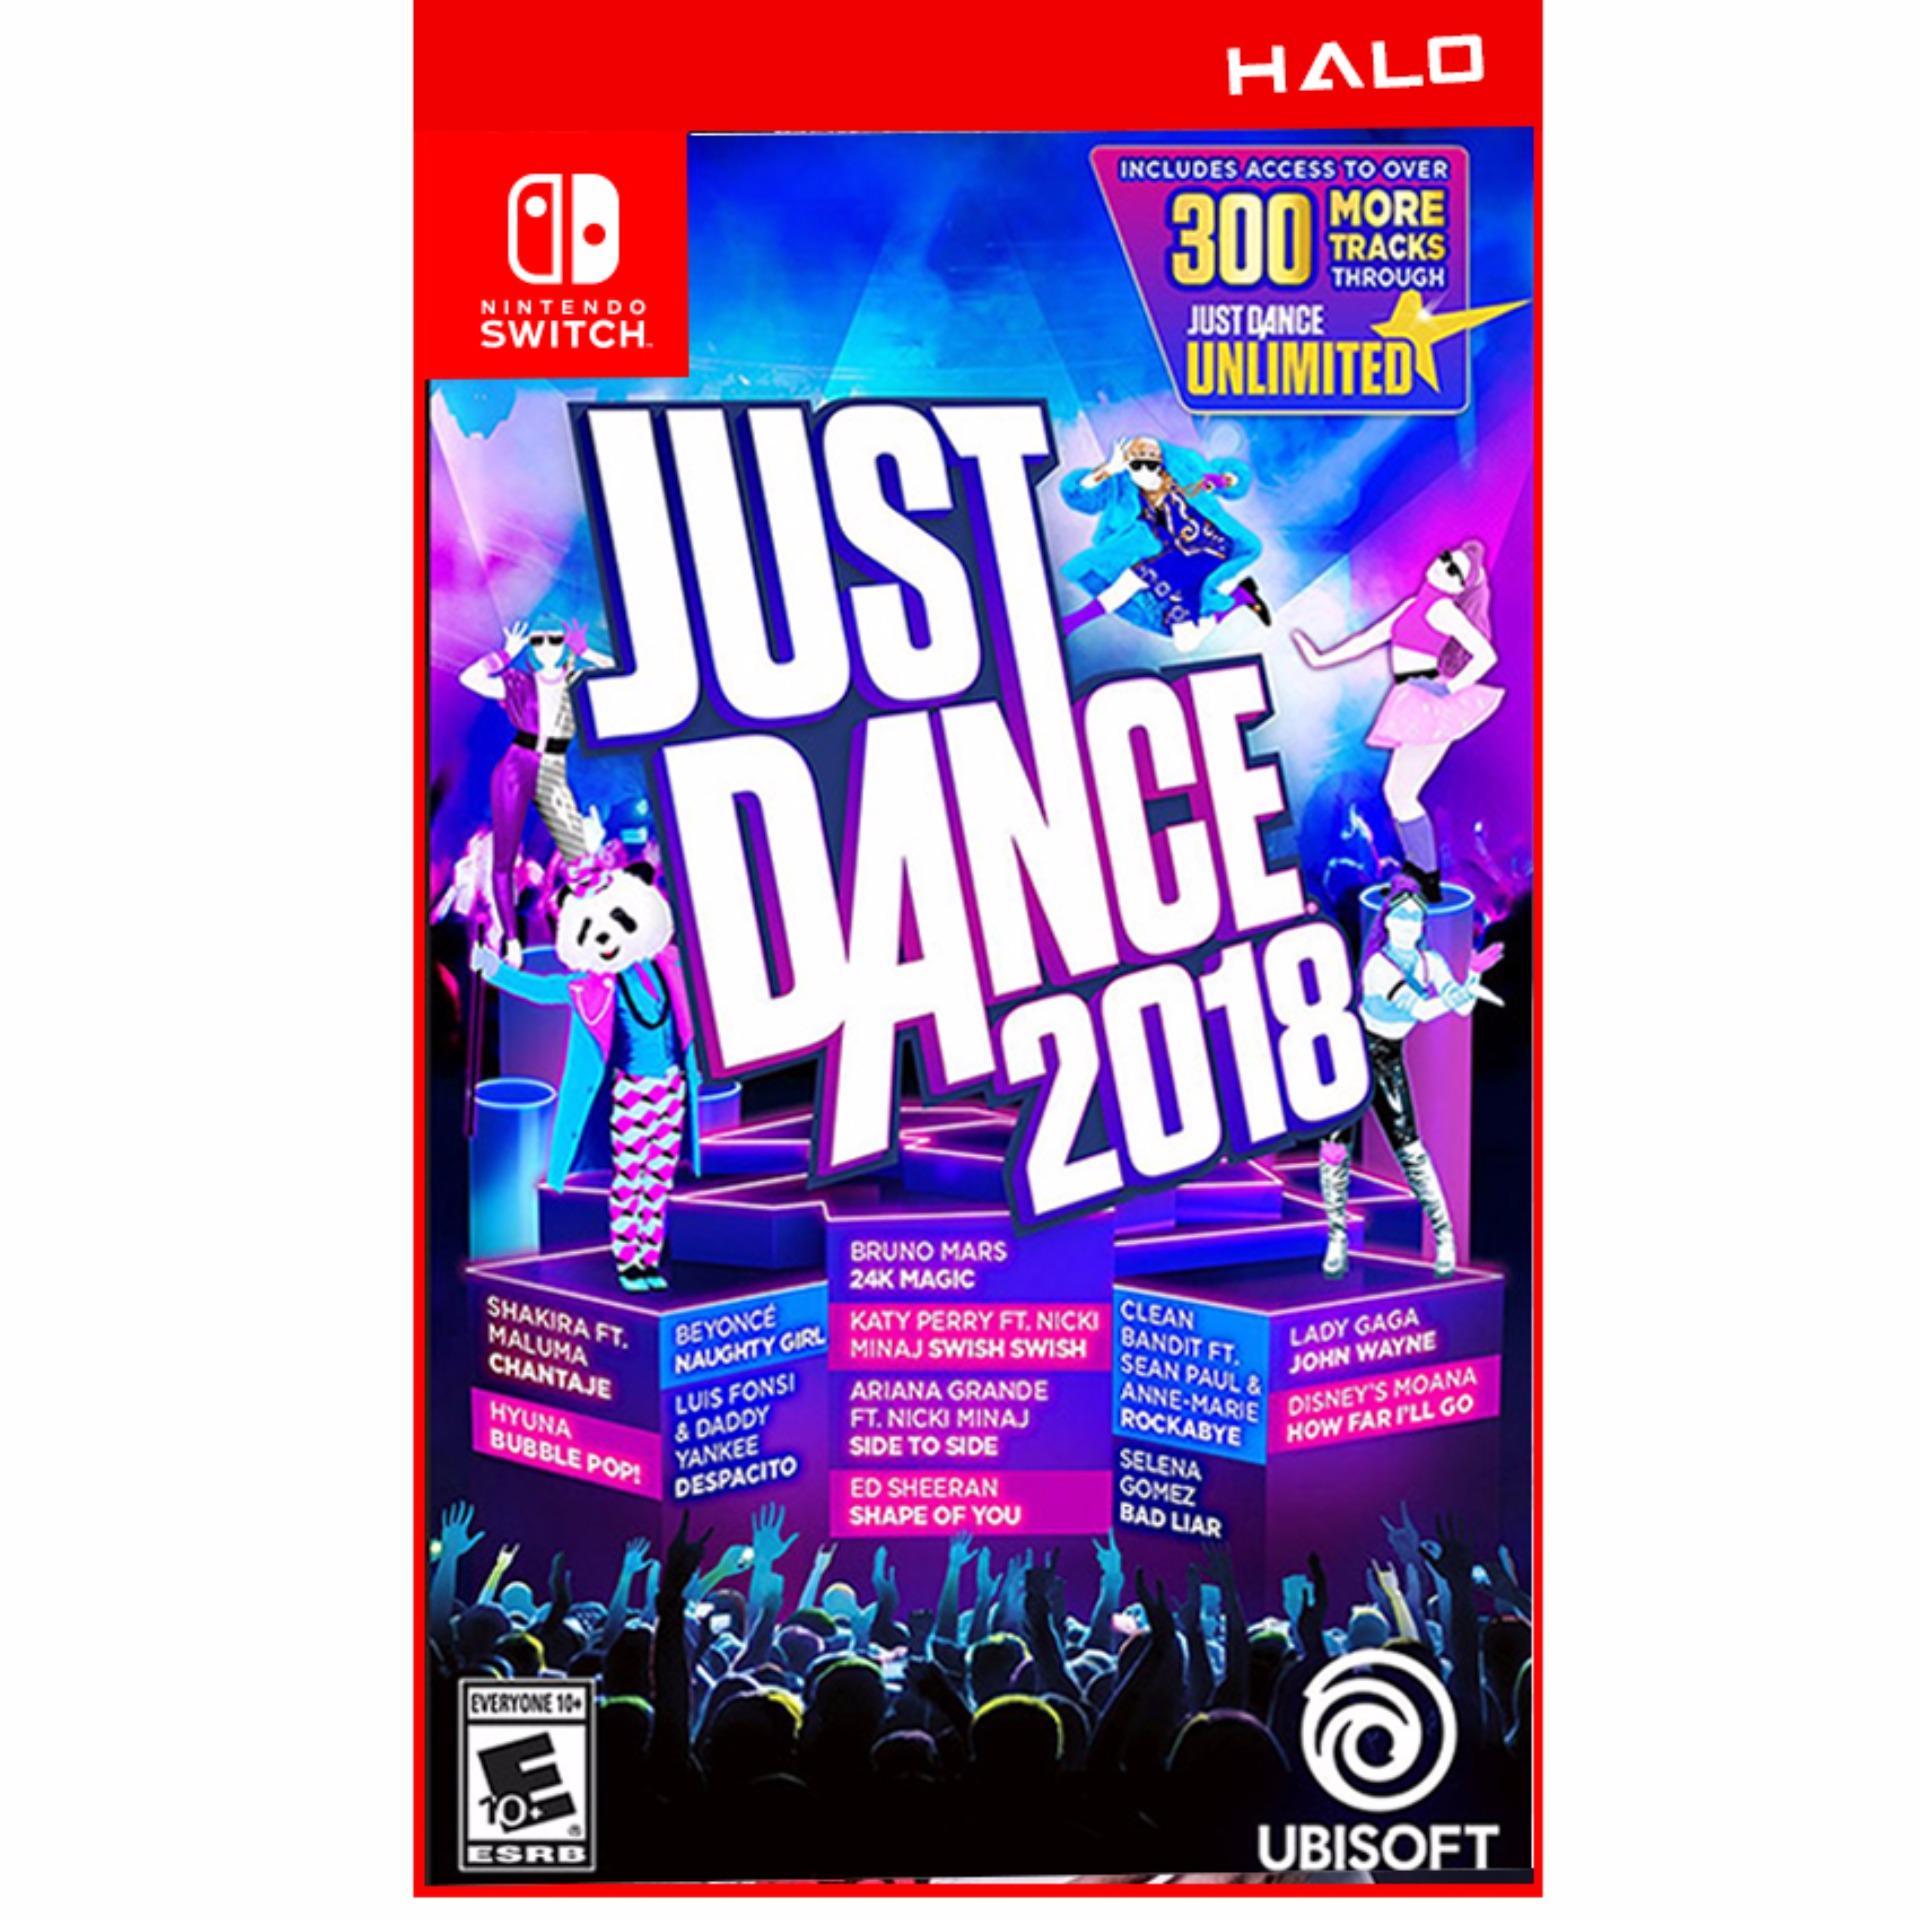 Game Nintendo Switch Just Dance 2018 – Phiên bản US